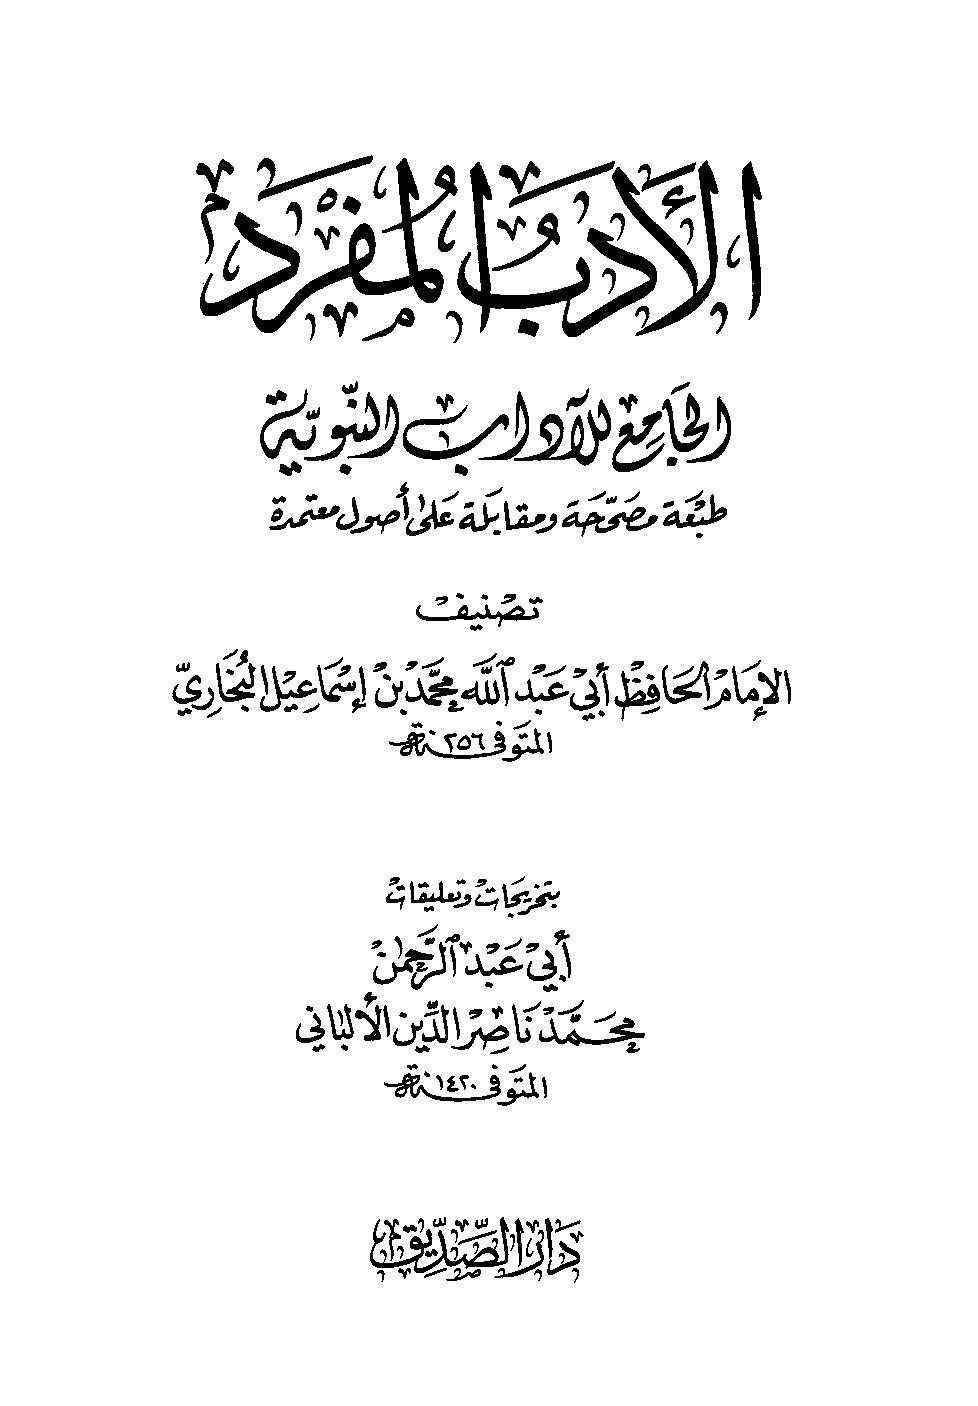 Adab_Mufrad_0000.jpg